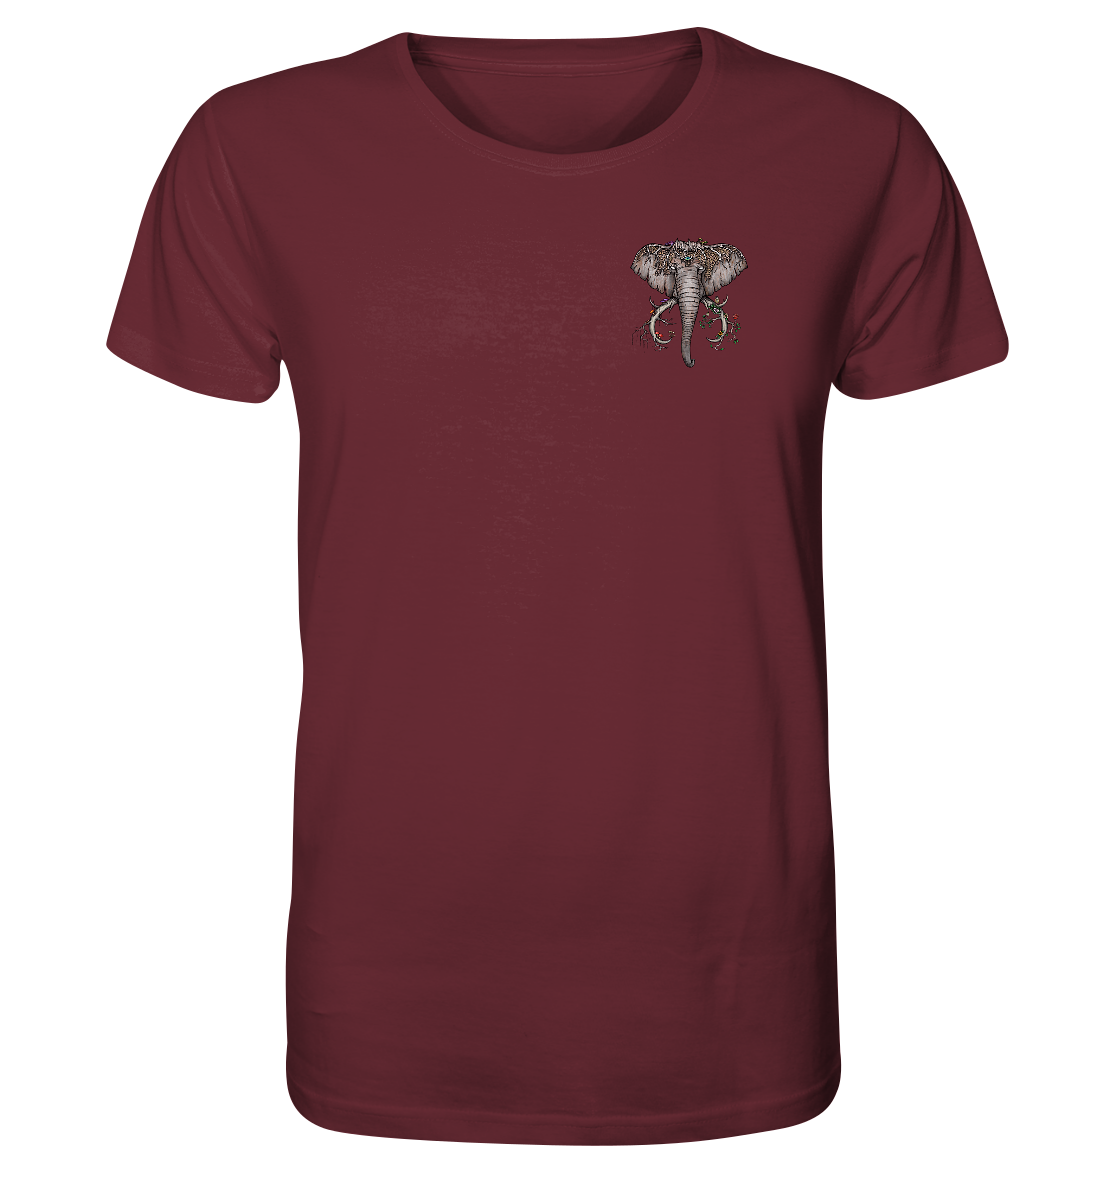 front-organic-shirt-672b34-1116x-3.png